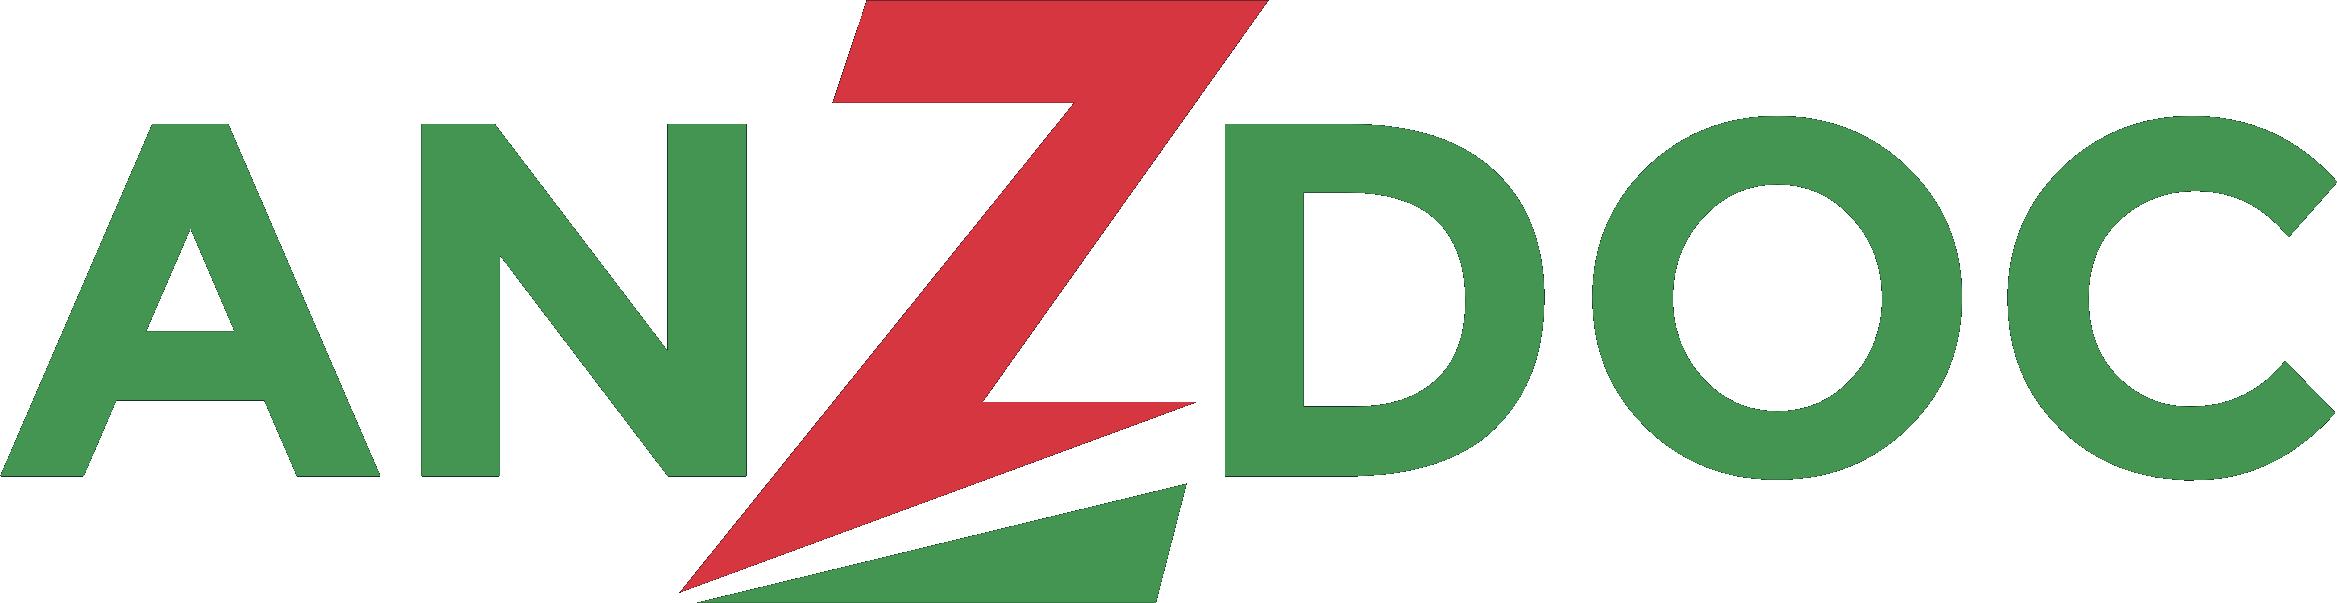 anzdoc logo